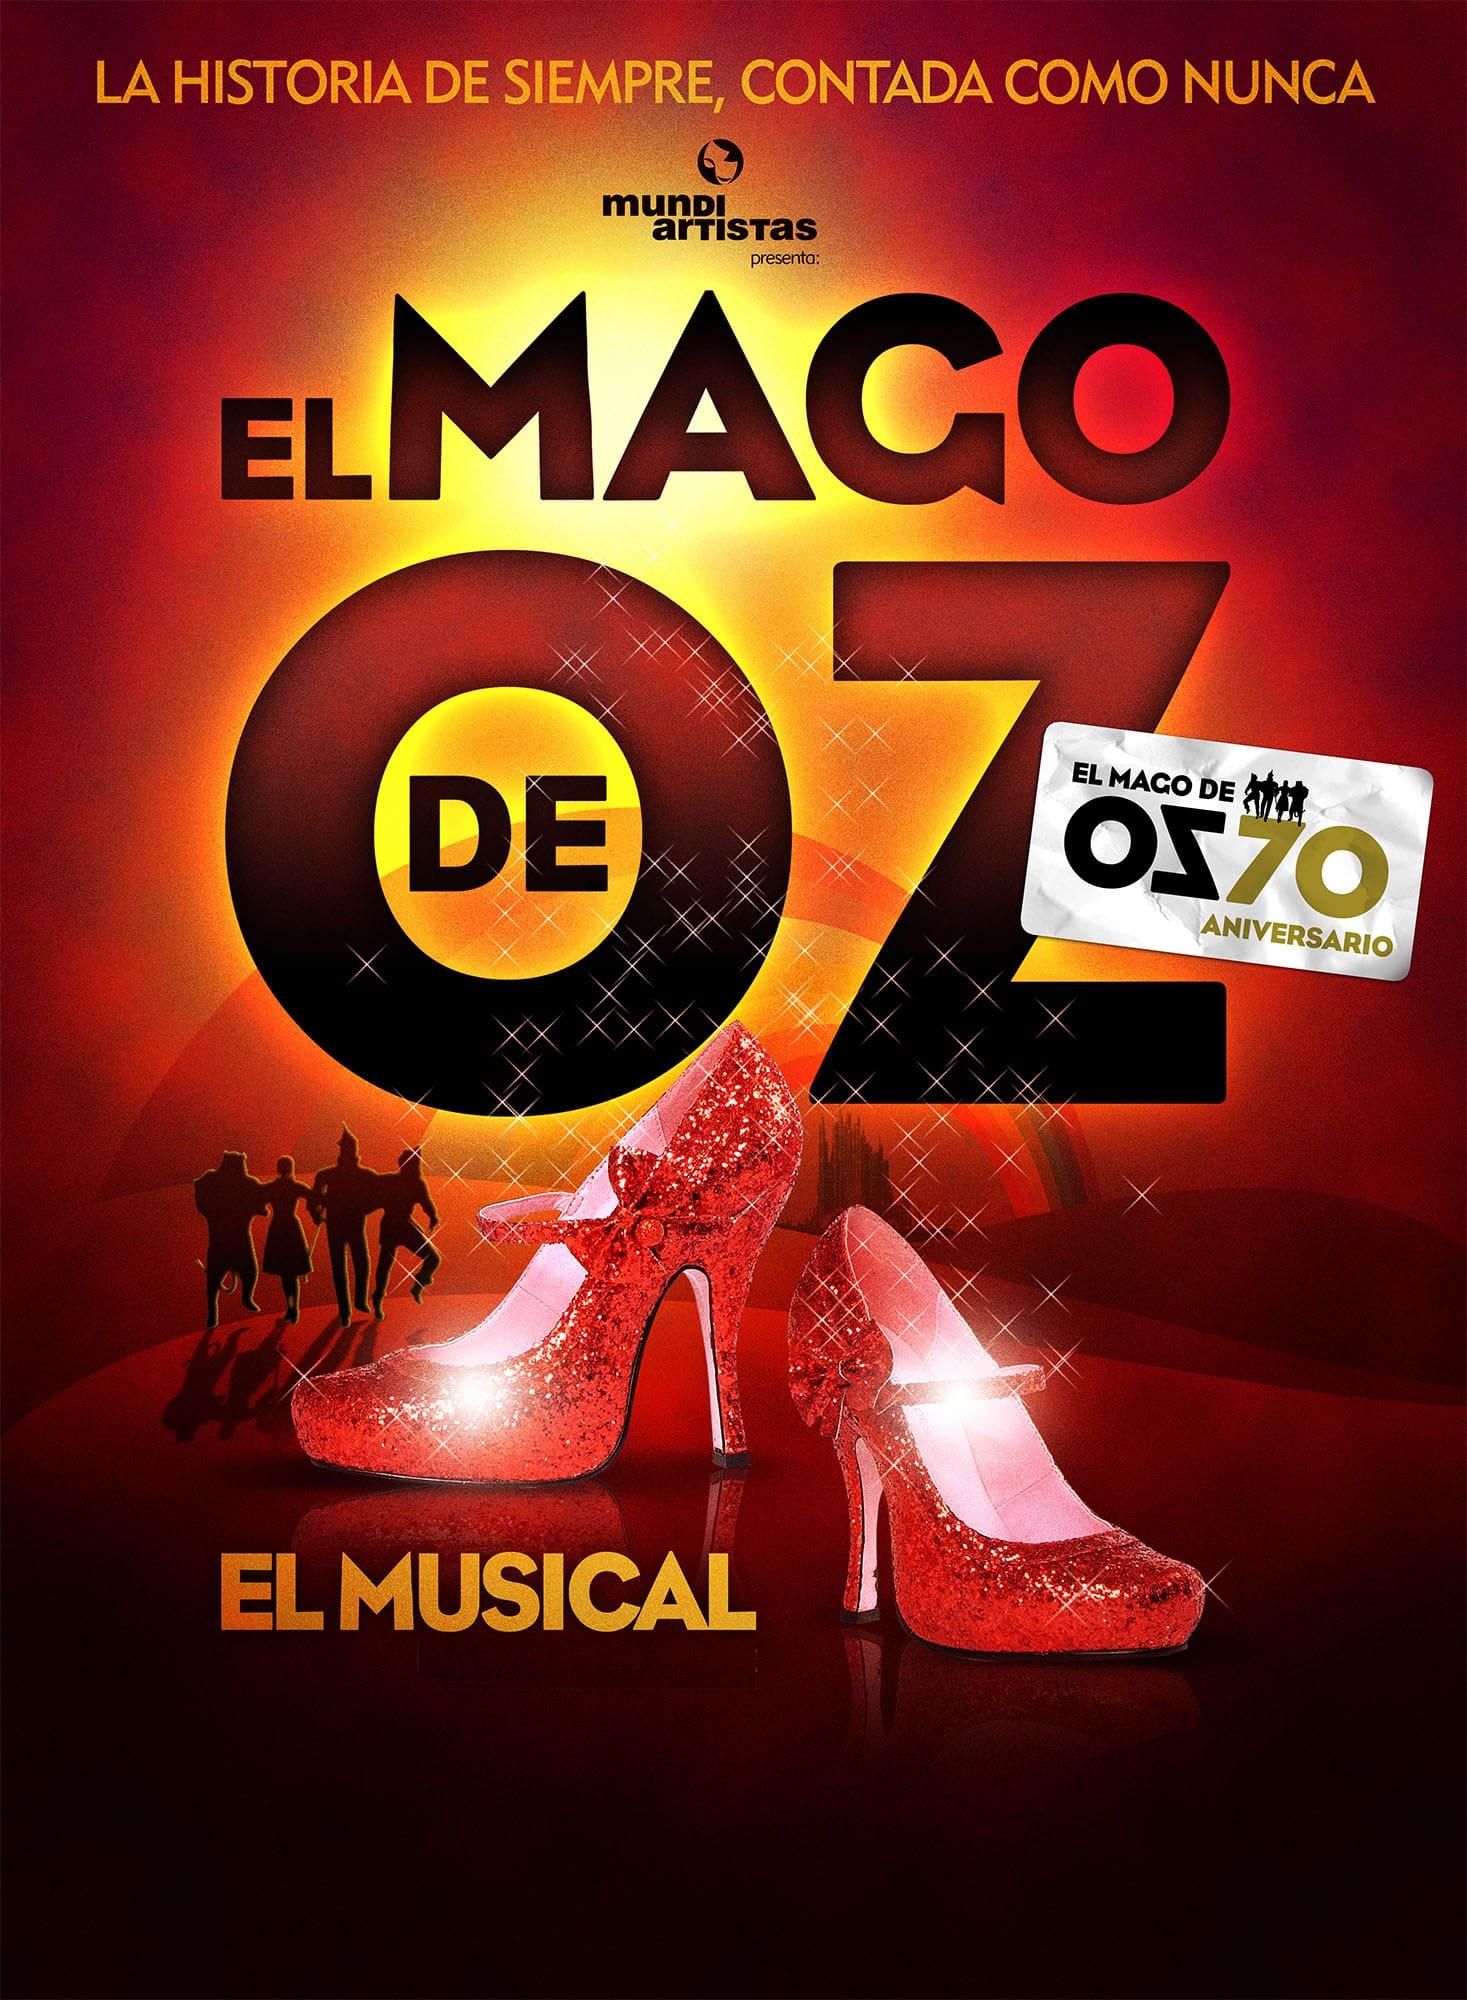 El Mago de Oz: el musical, una obra de la película